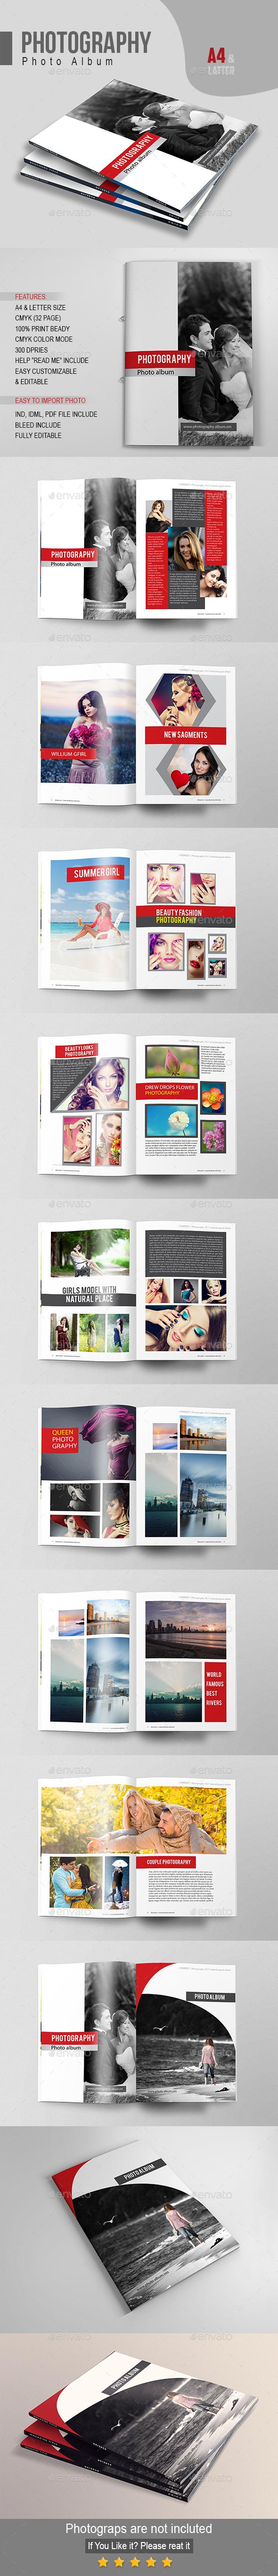 Photography Photo Album - Photo Albums Print Templates